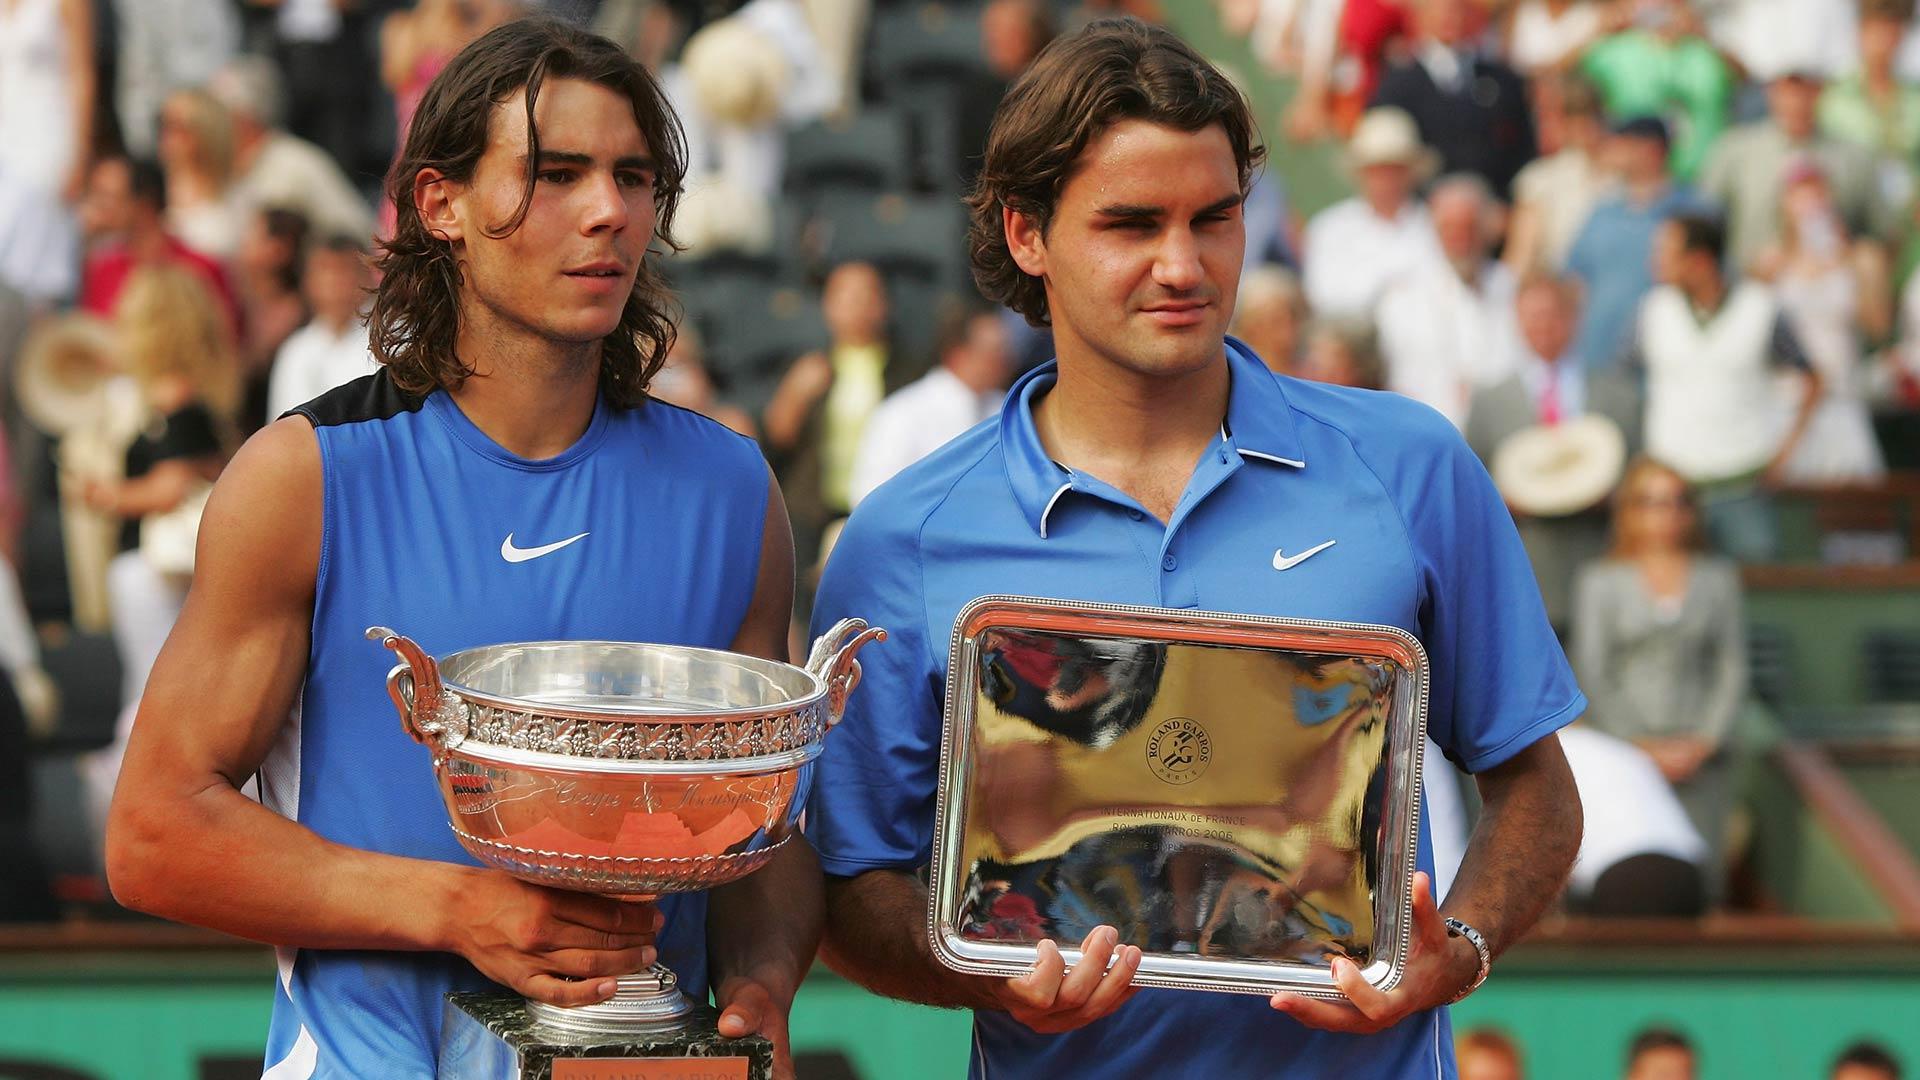 Rafa y Roger - RG '06 - EFE